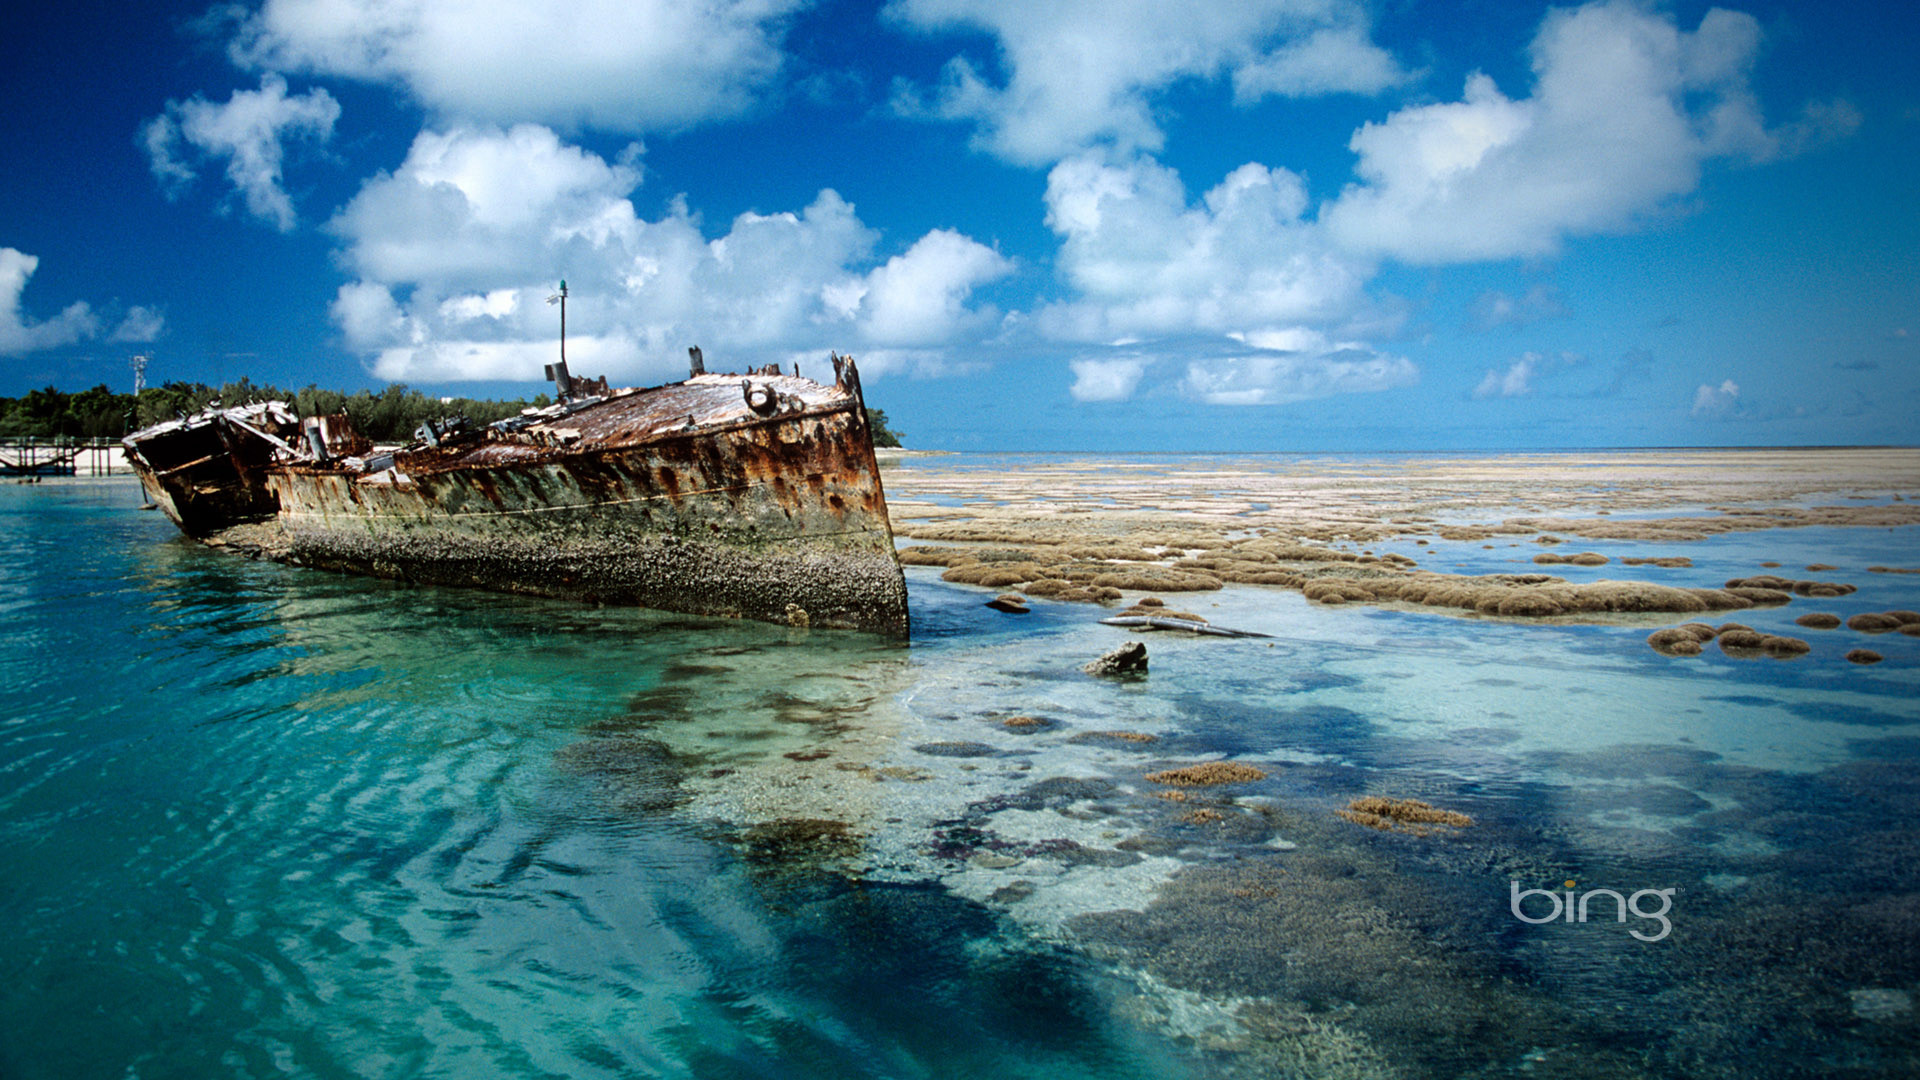 Bing Shipwreck on Heron Island desktop background Australia full hd.